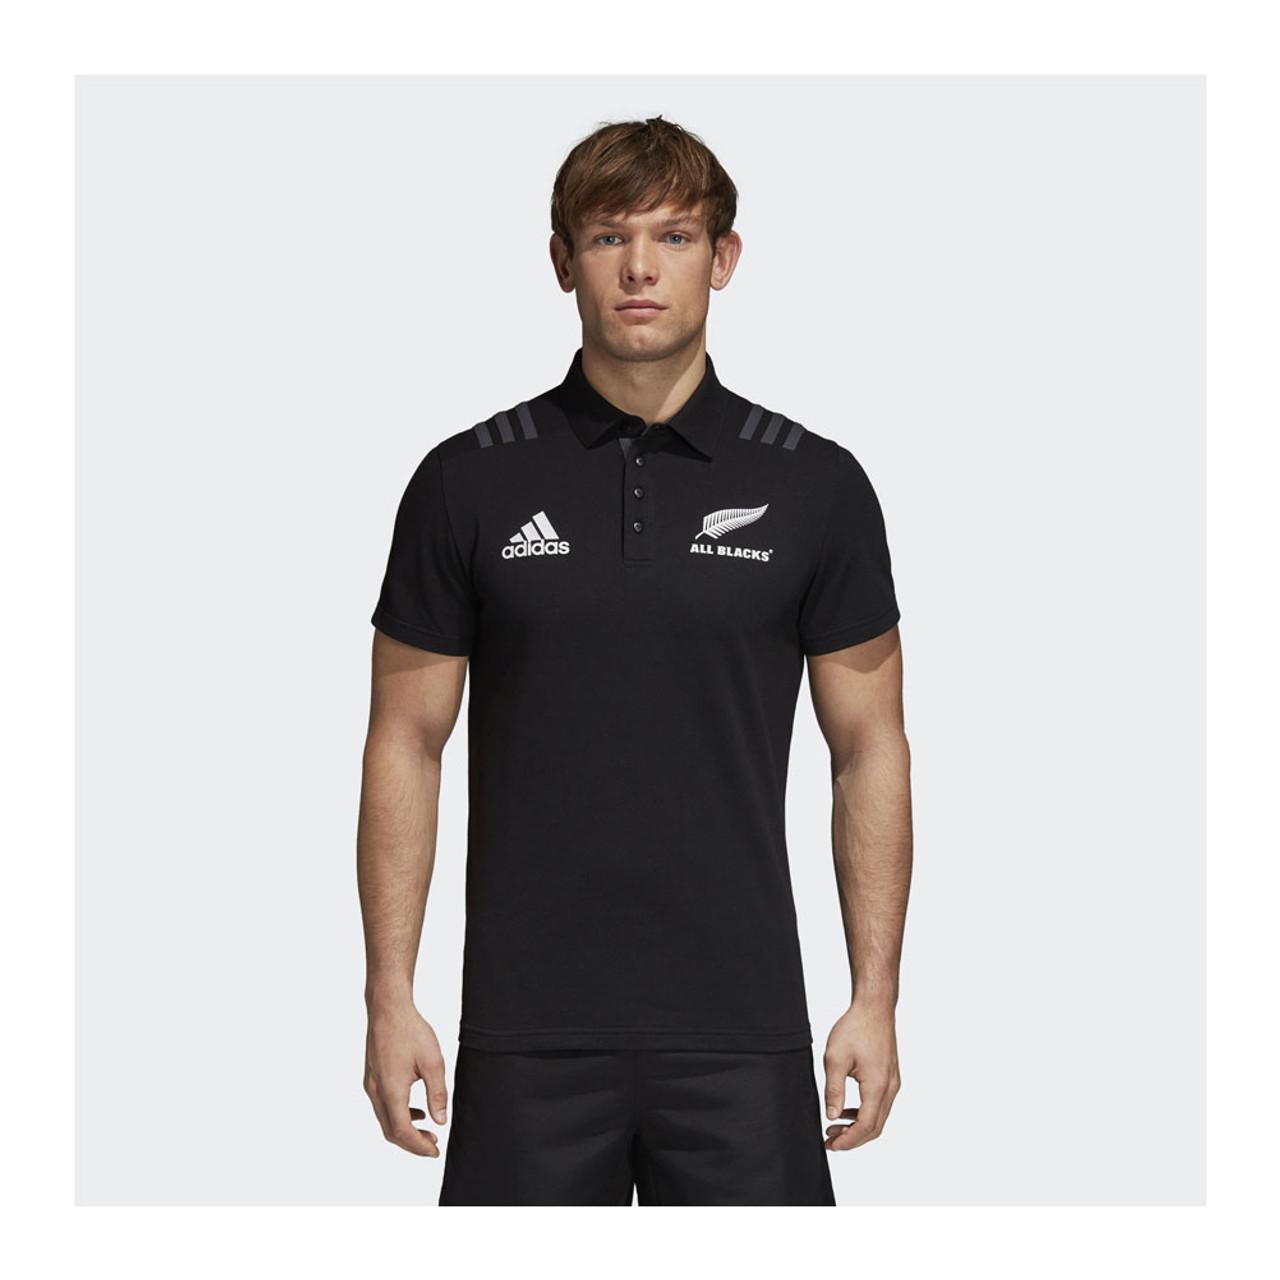 be1e1511c4d ADIDAS new zealand all blacks rugby polo shirt [black]